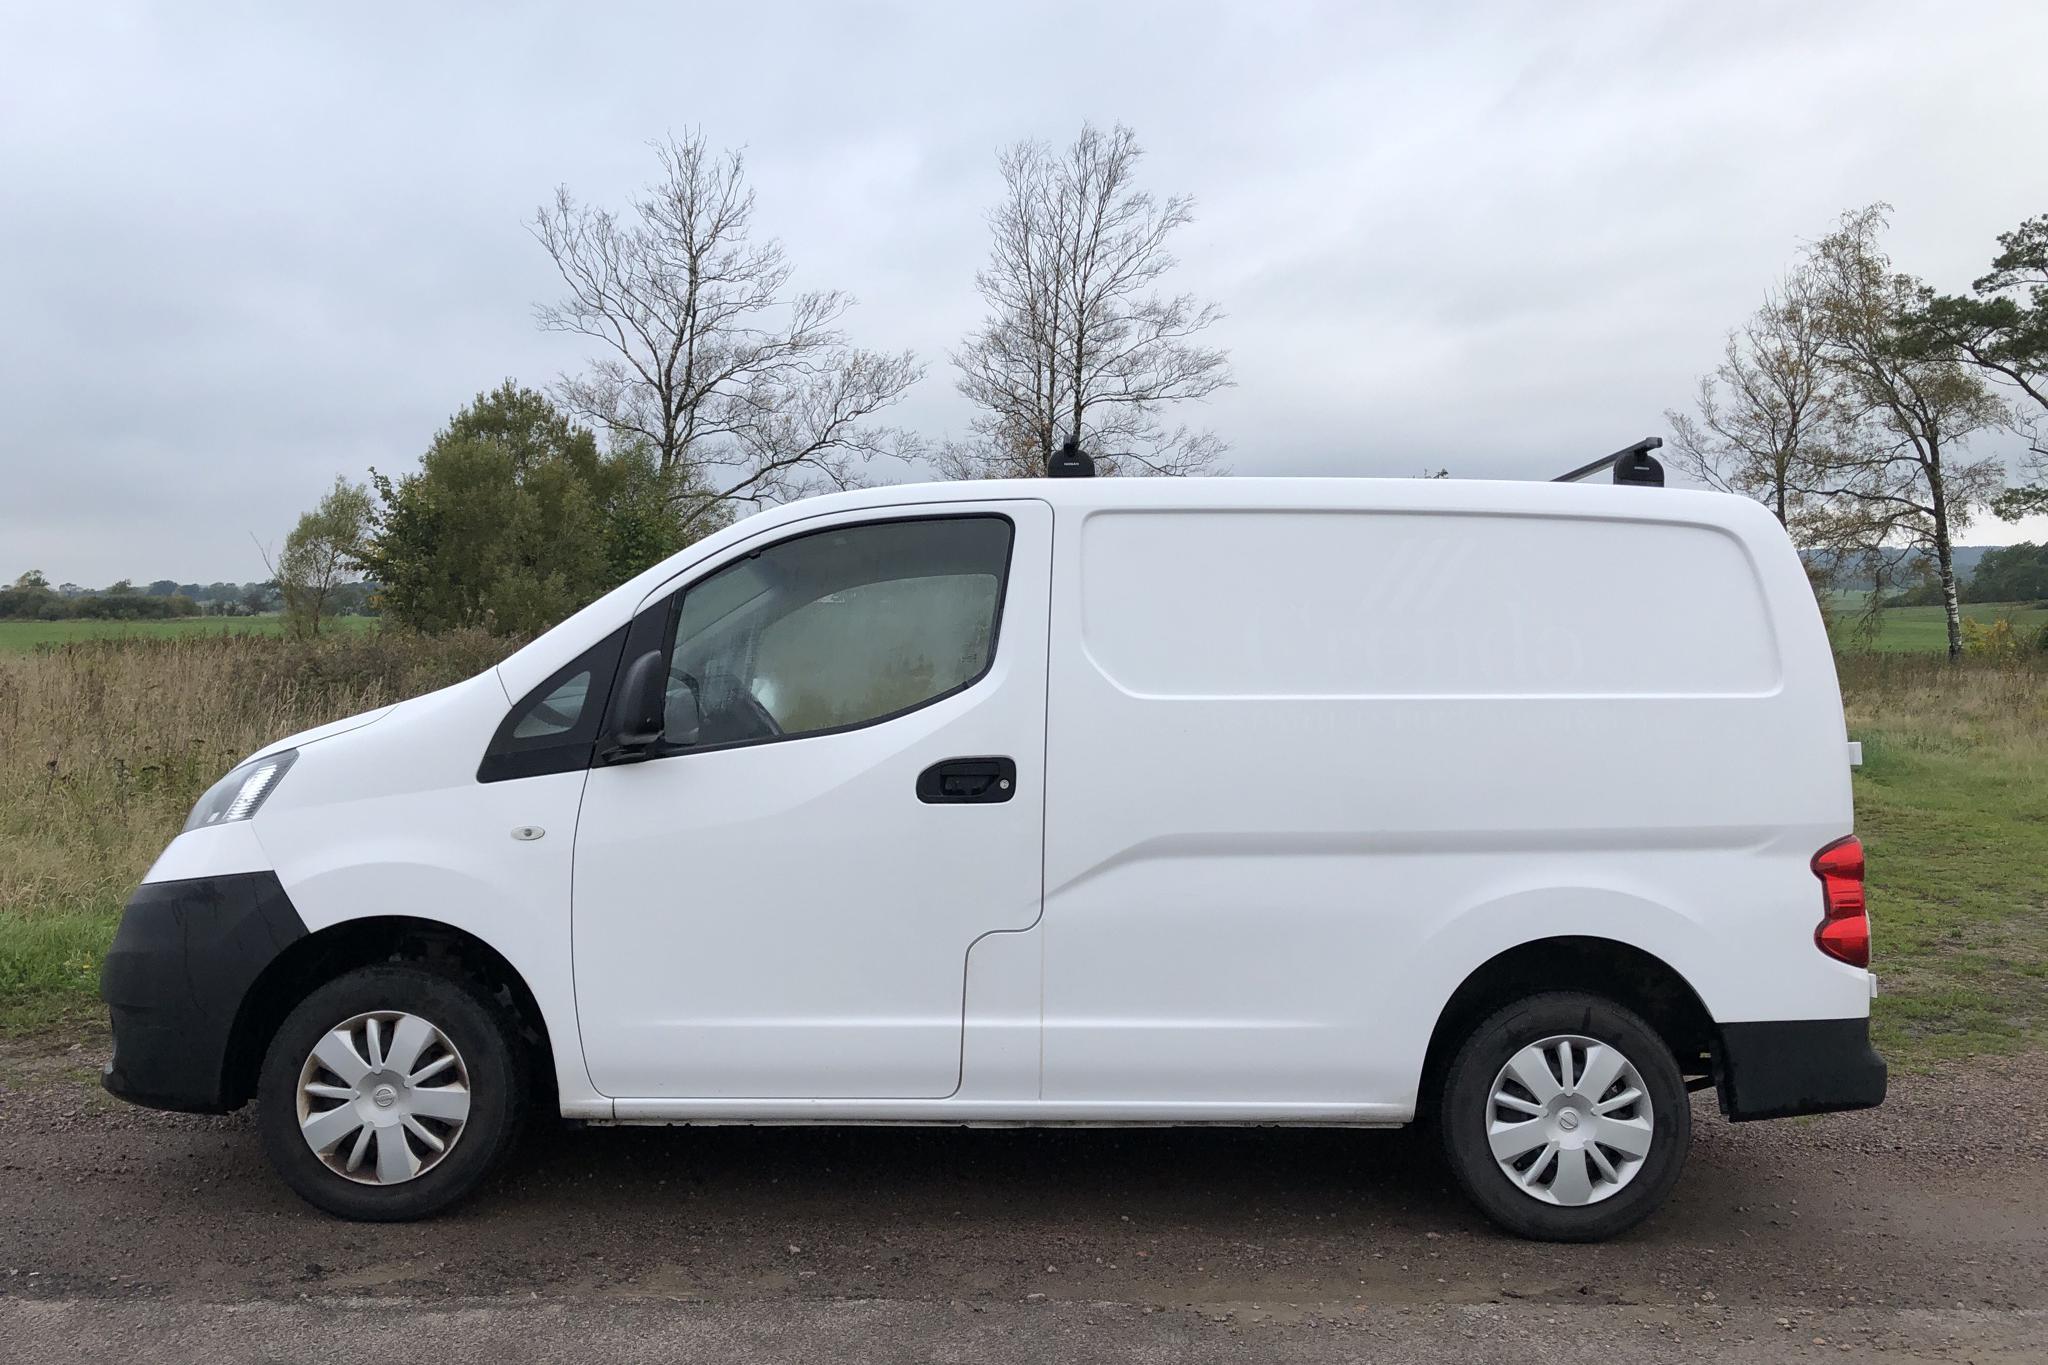 Nissan NV200 1.5 dCi Skåp (90hk) - 7 957 mil - Manuell - vit - 2014